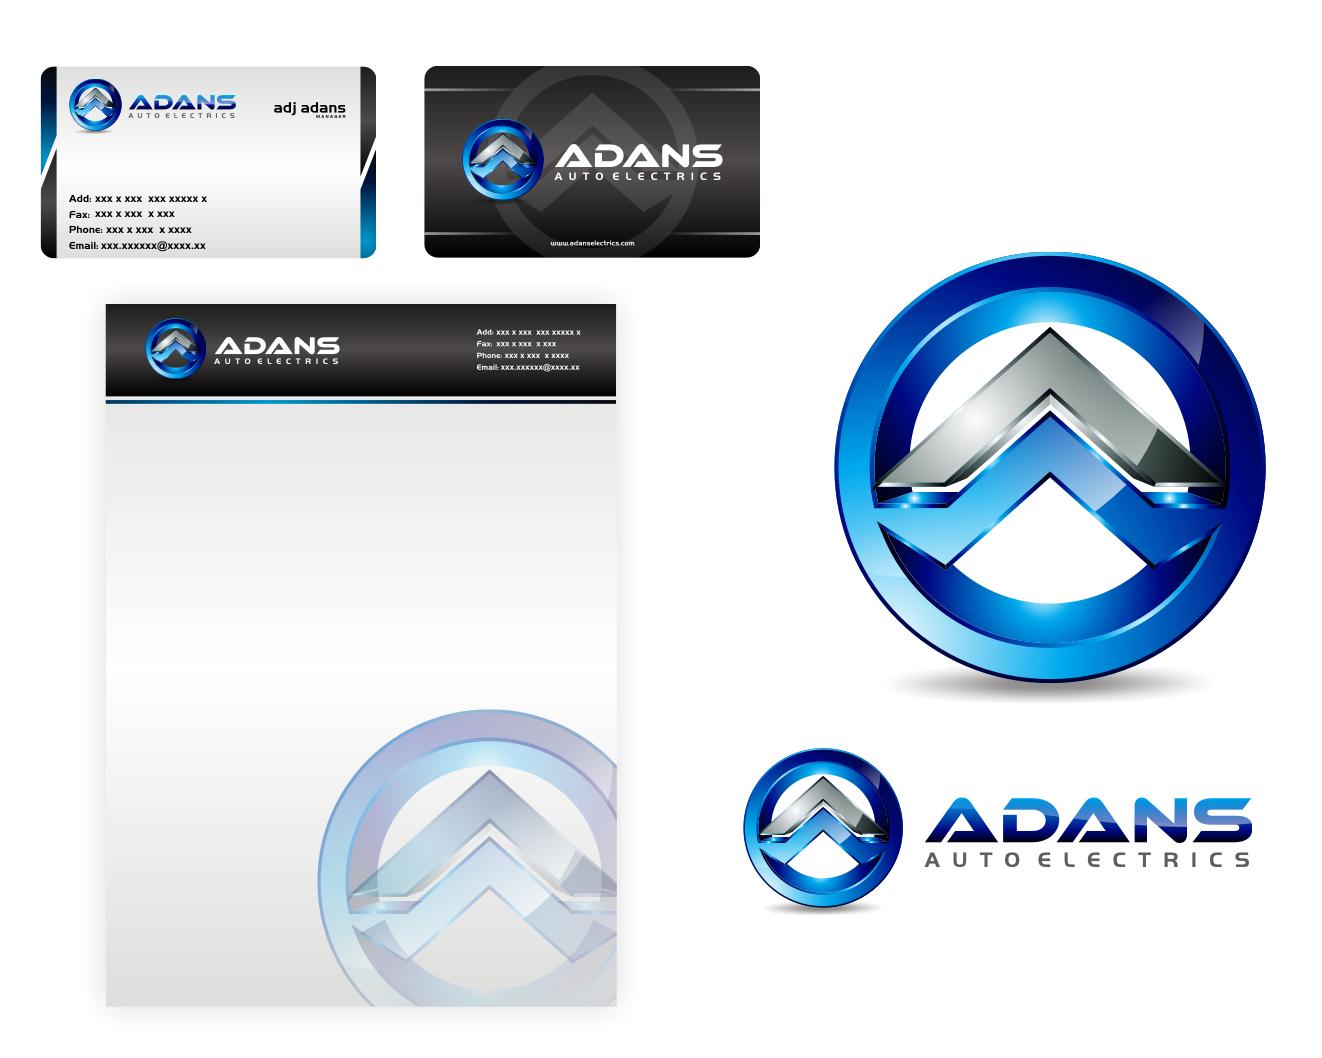 Adans Auto Electrics  needs a new logo